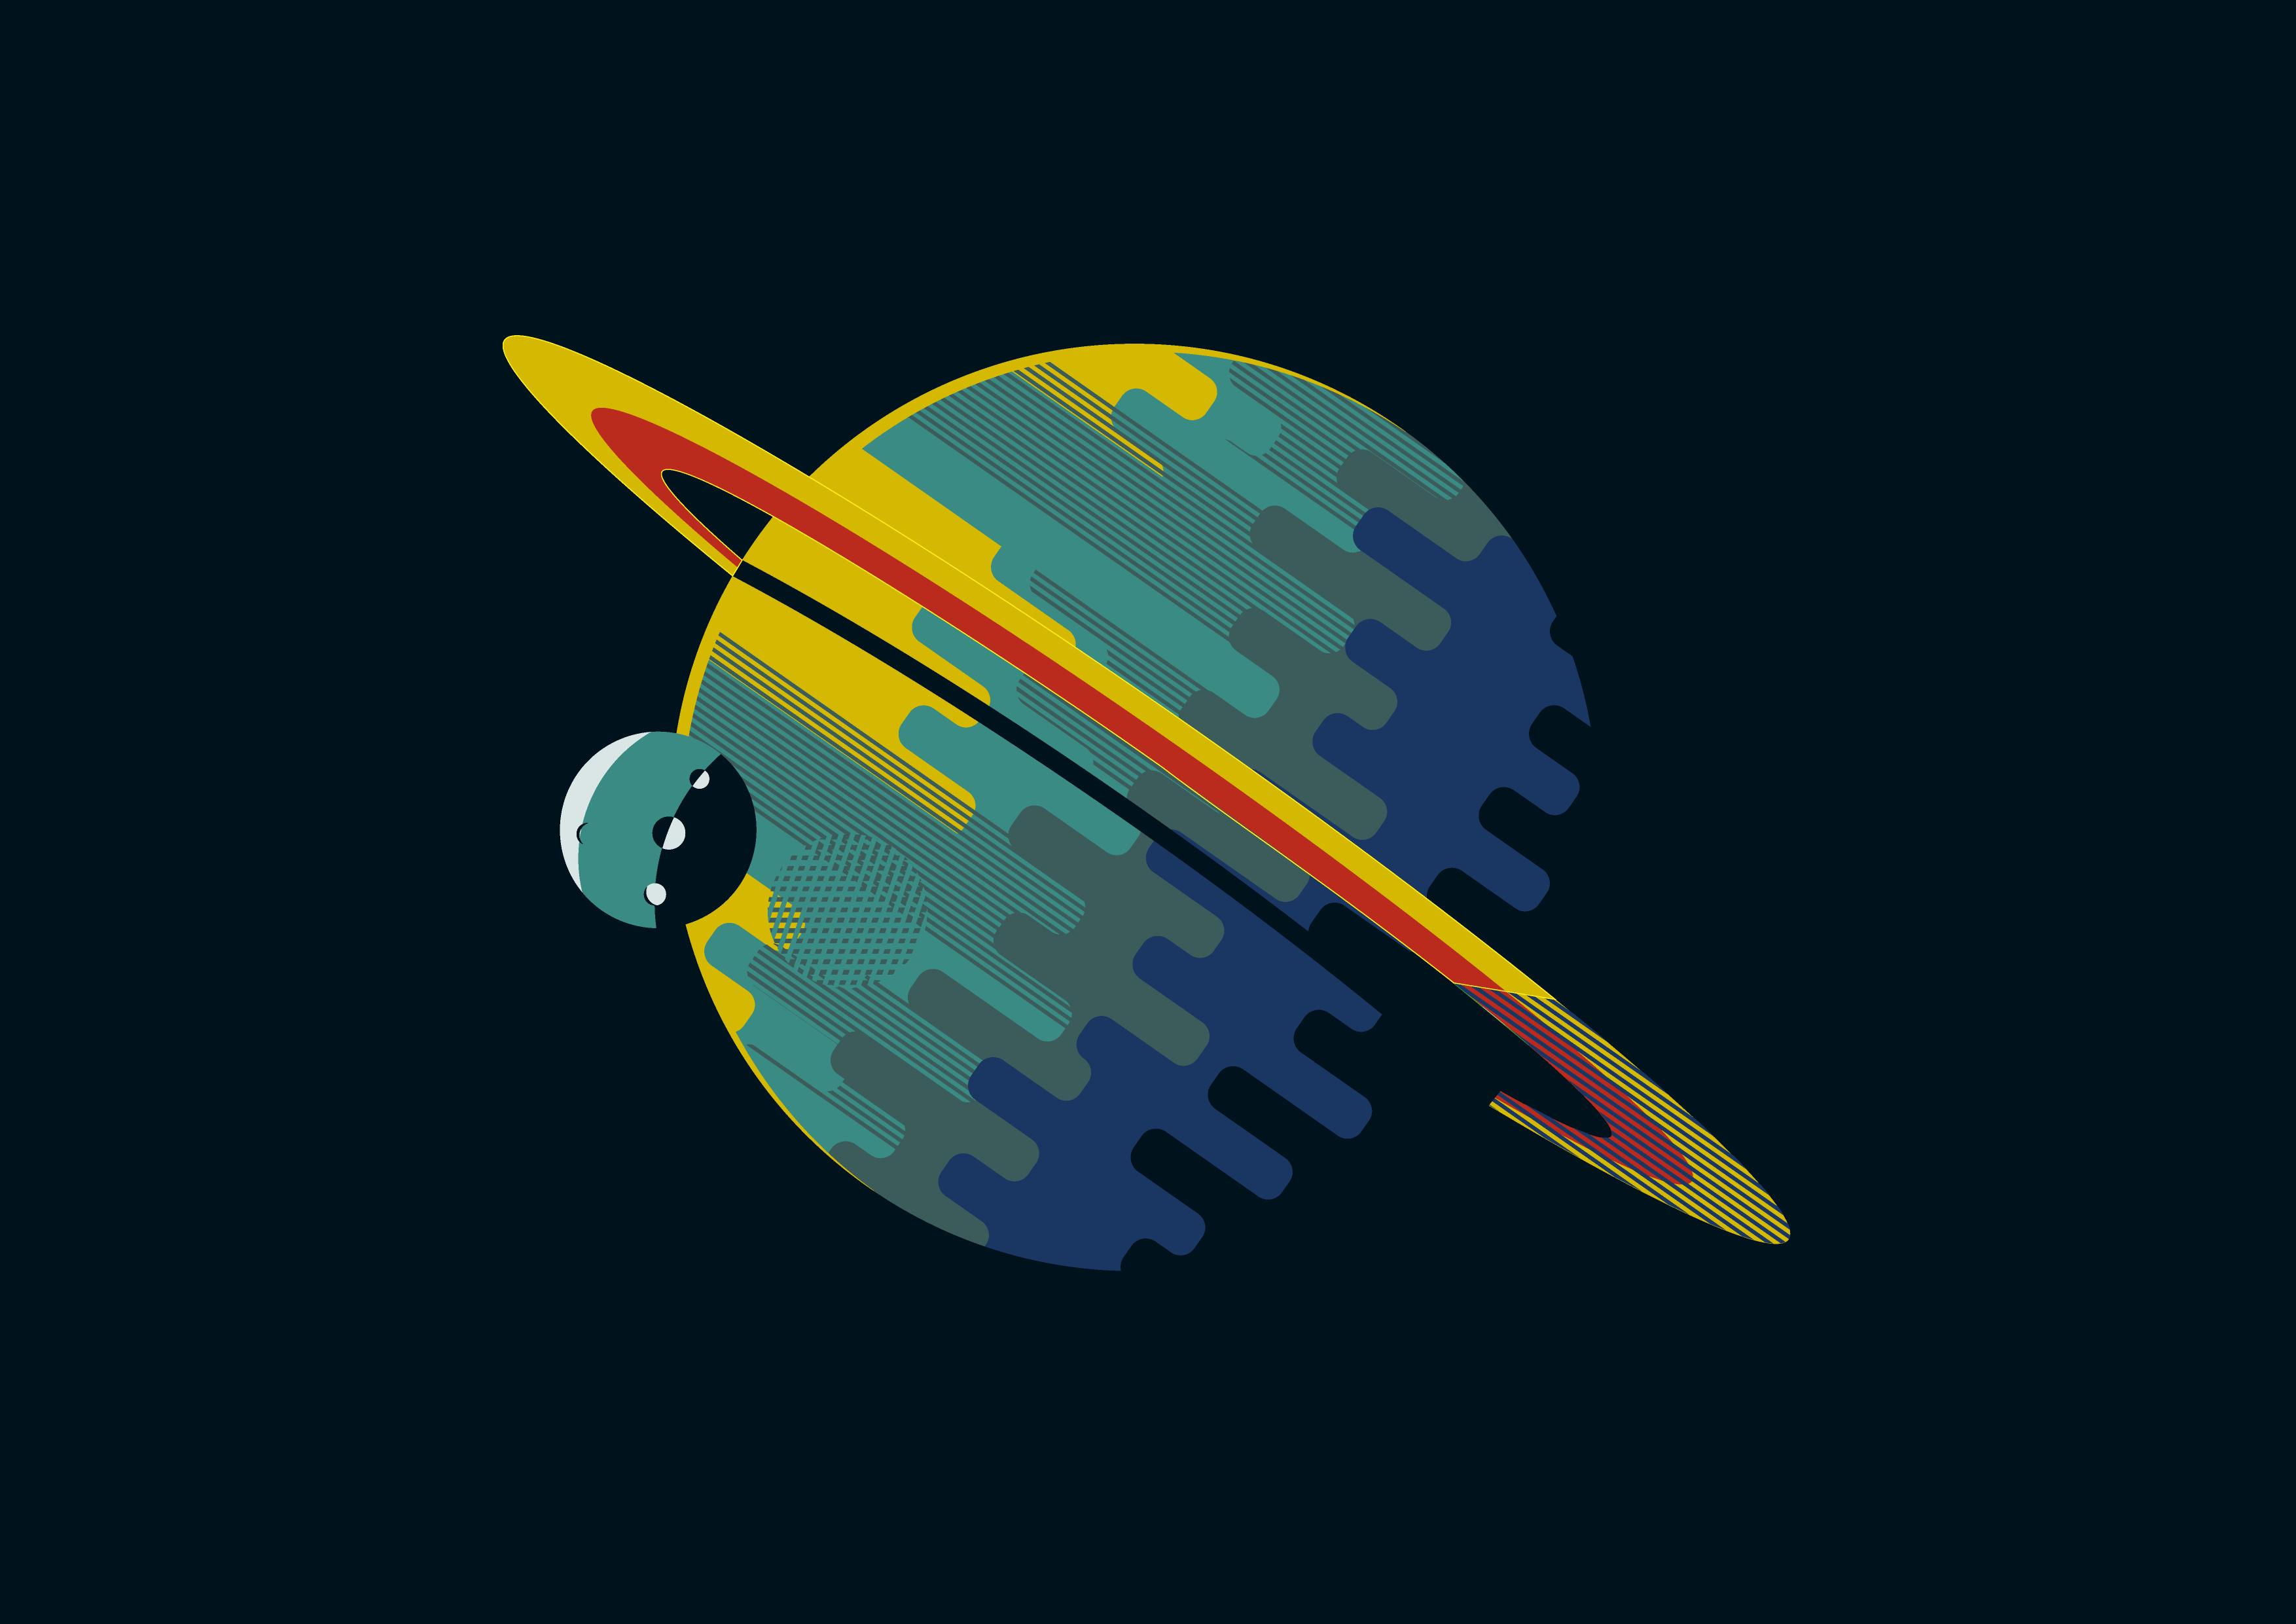 Planet Colors Minimalist 3508x2481